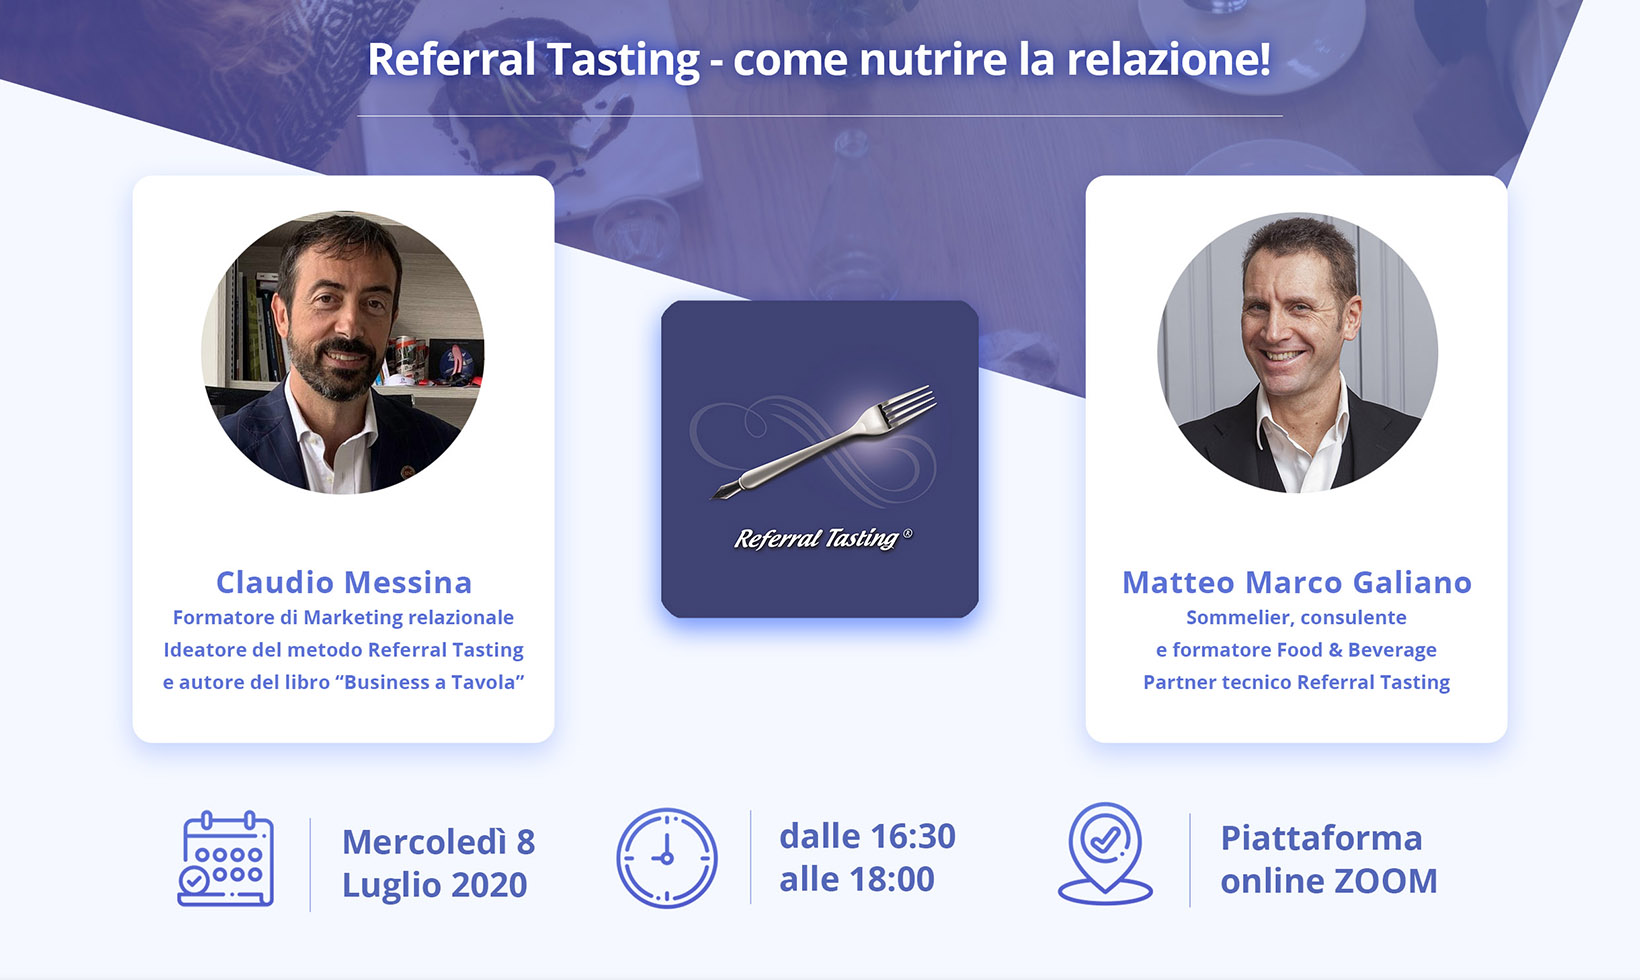 Webinar 8 luglio 2020 - Referral Tasting - Claudio Messina